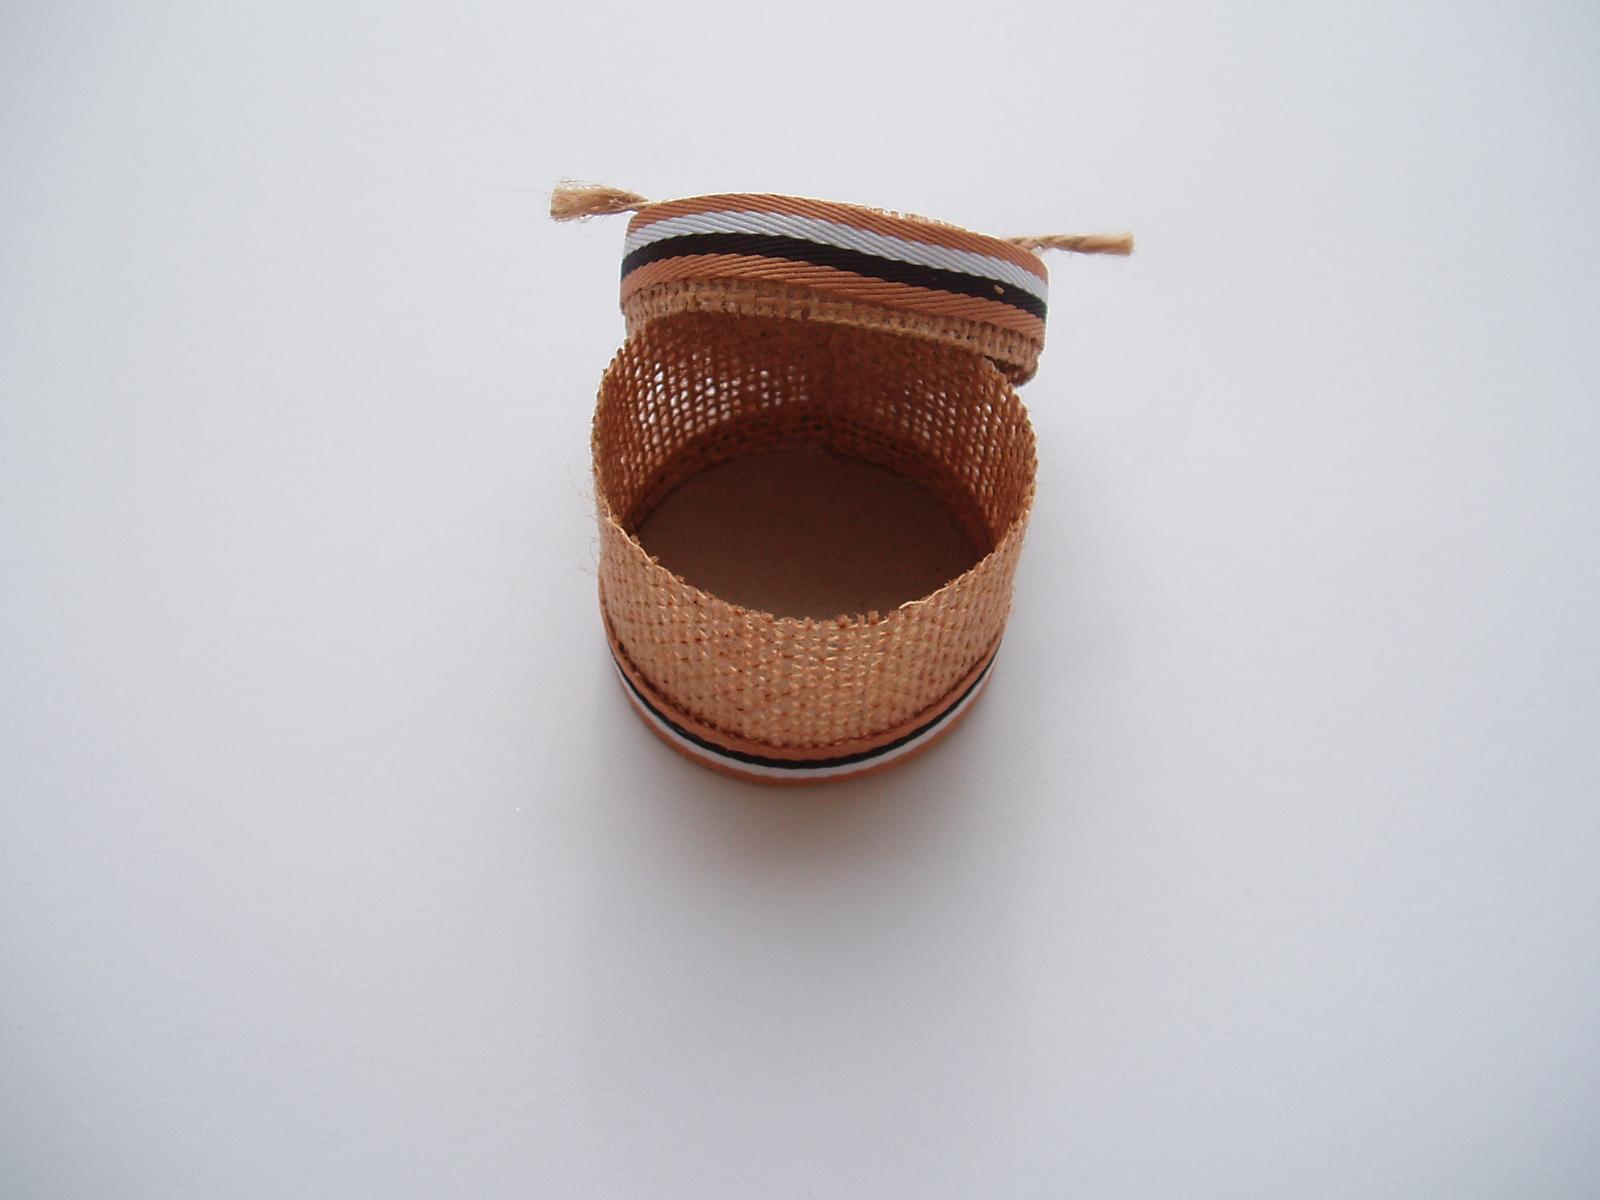 jutová krabička - Obrázek č. 4